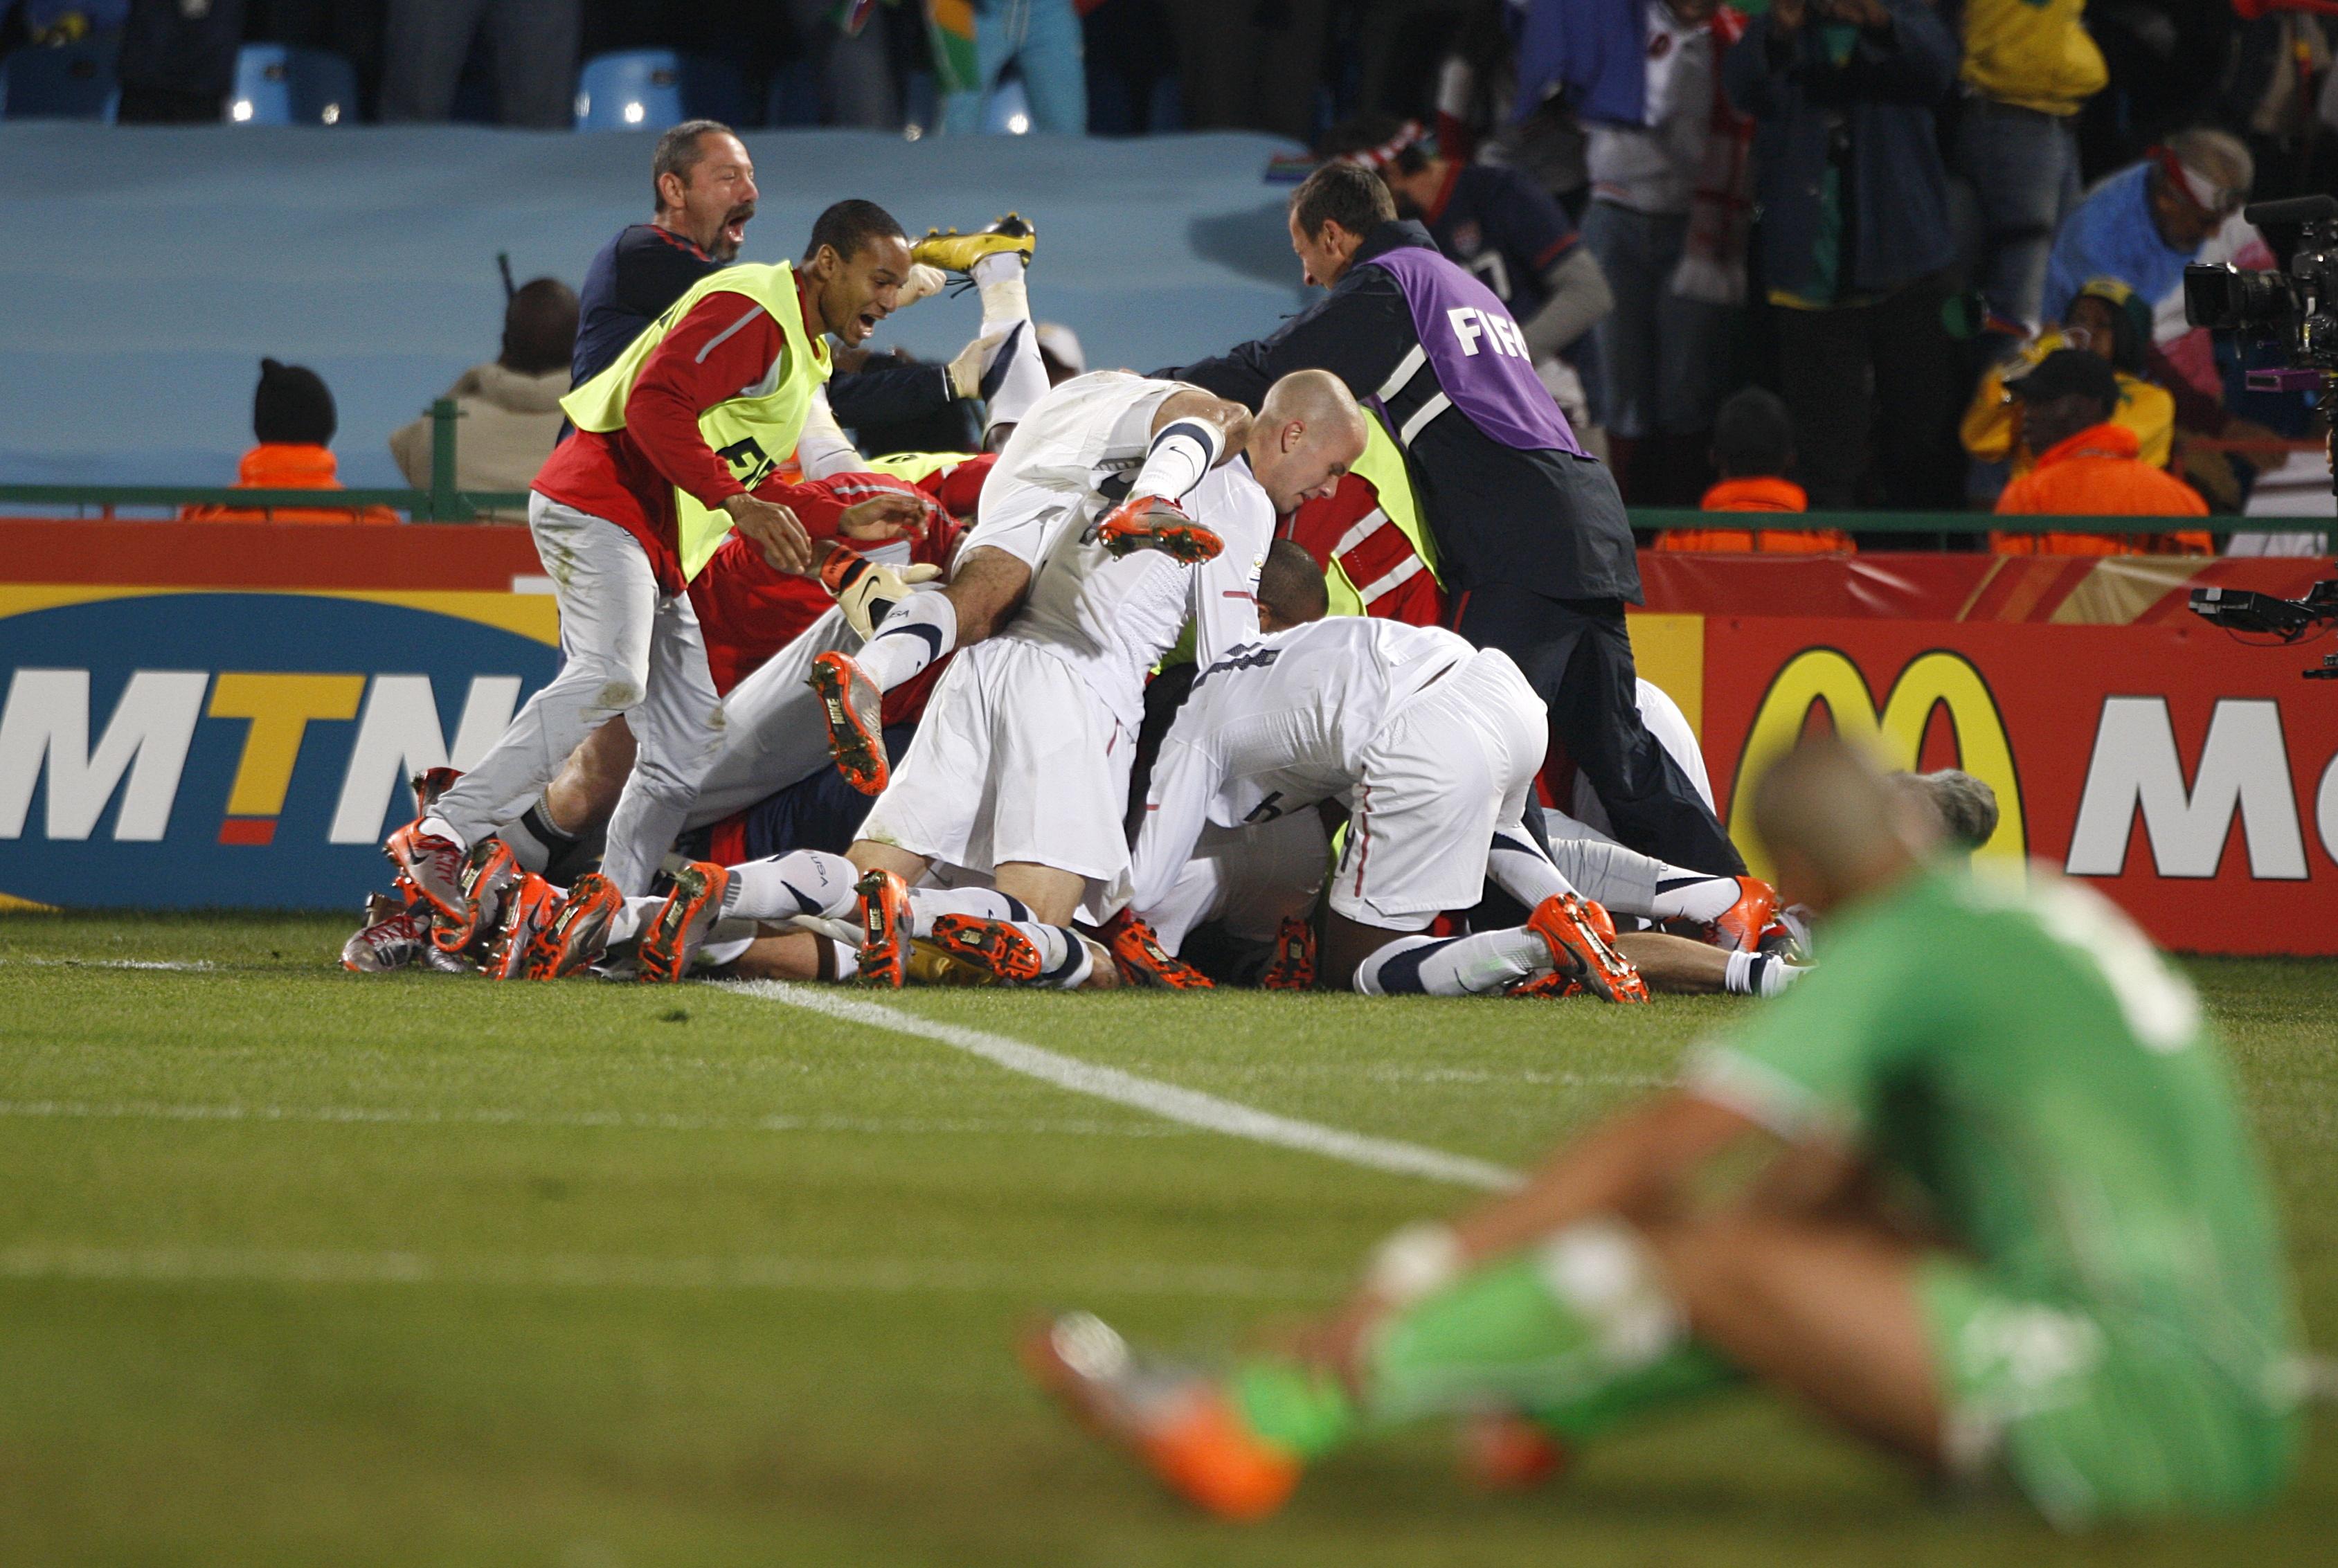 Soccer - 2010 FIFA World Cup South Africa - Group C - USA v Algeria - Loftus Versfeld Stadium